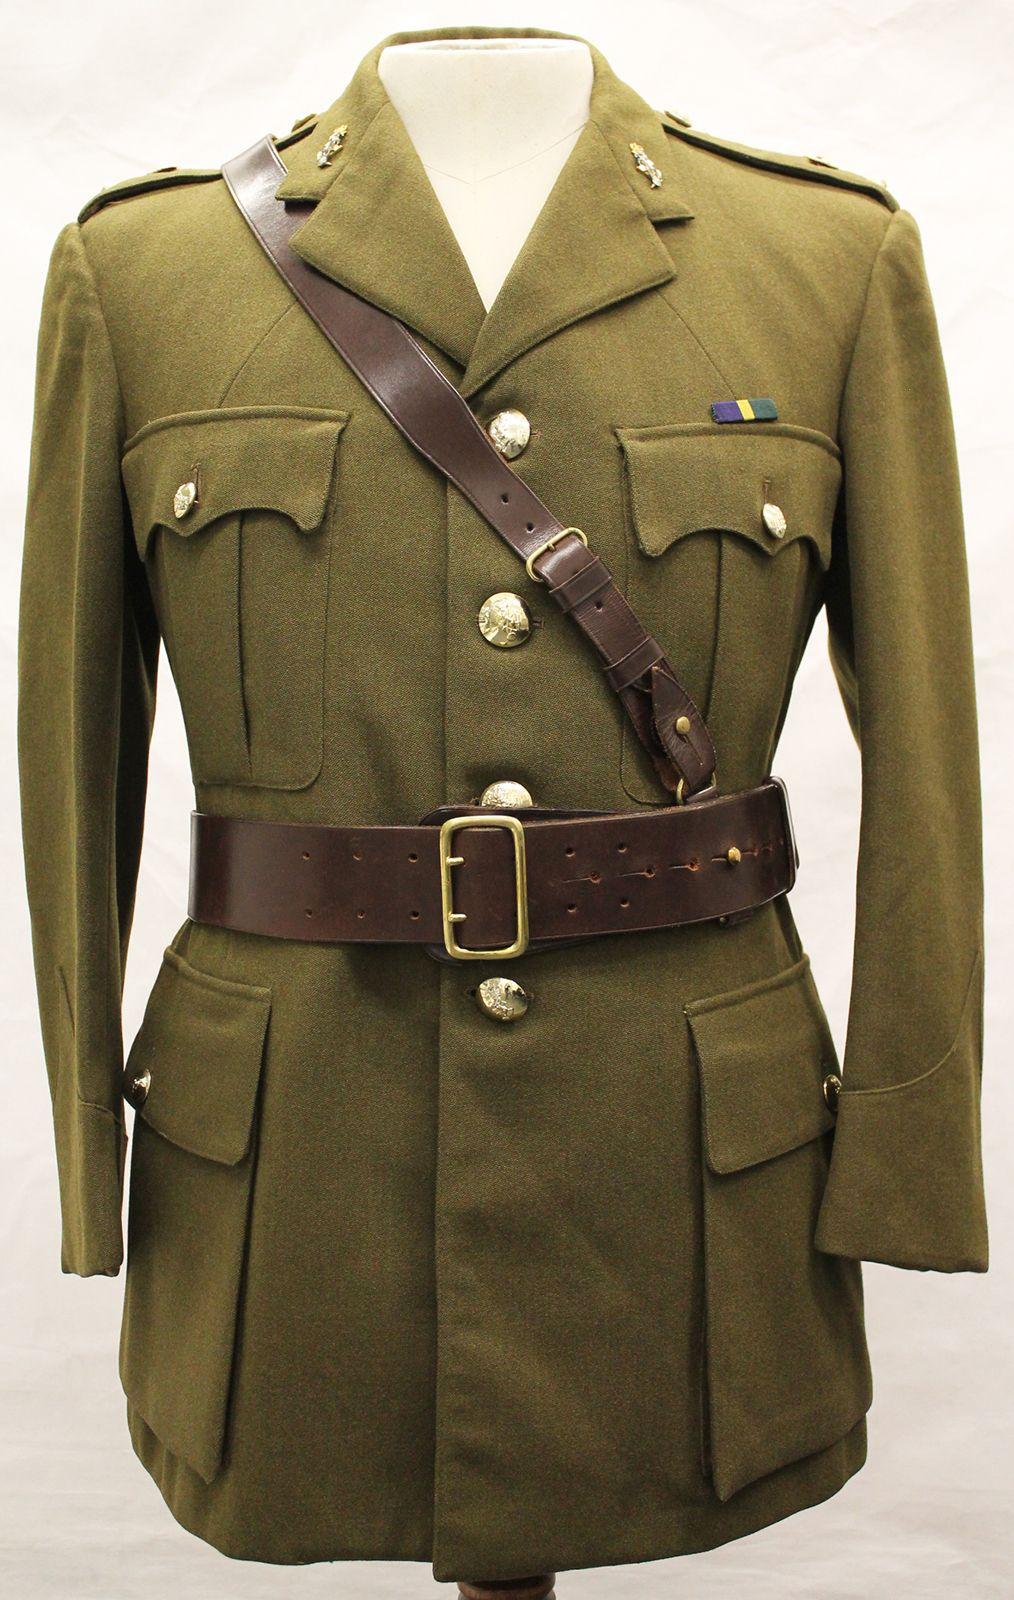 1957-1974 military uniform